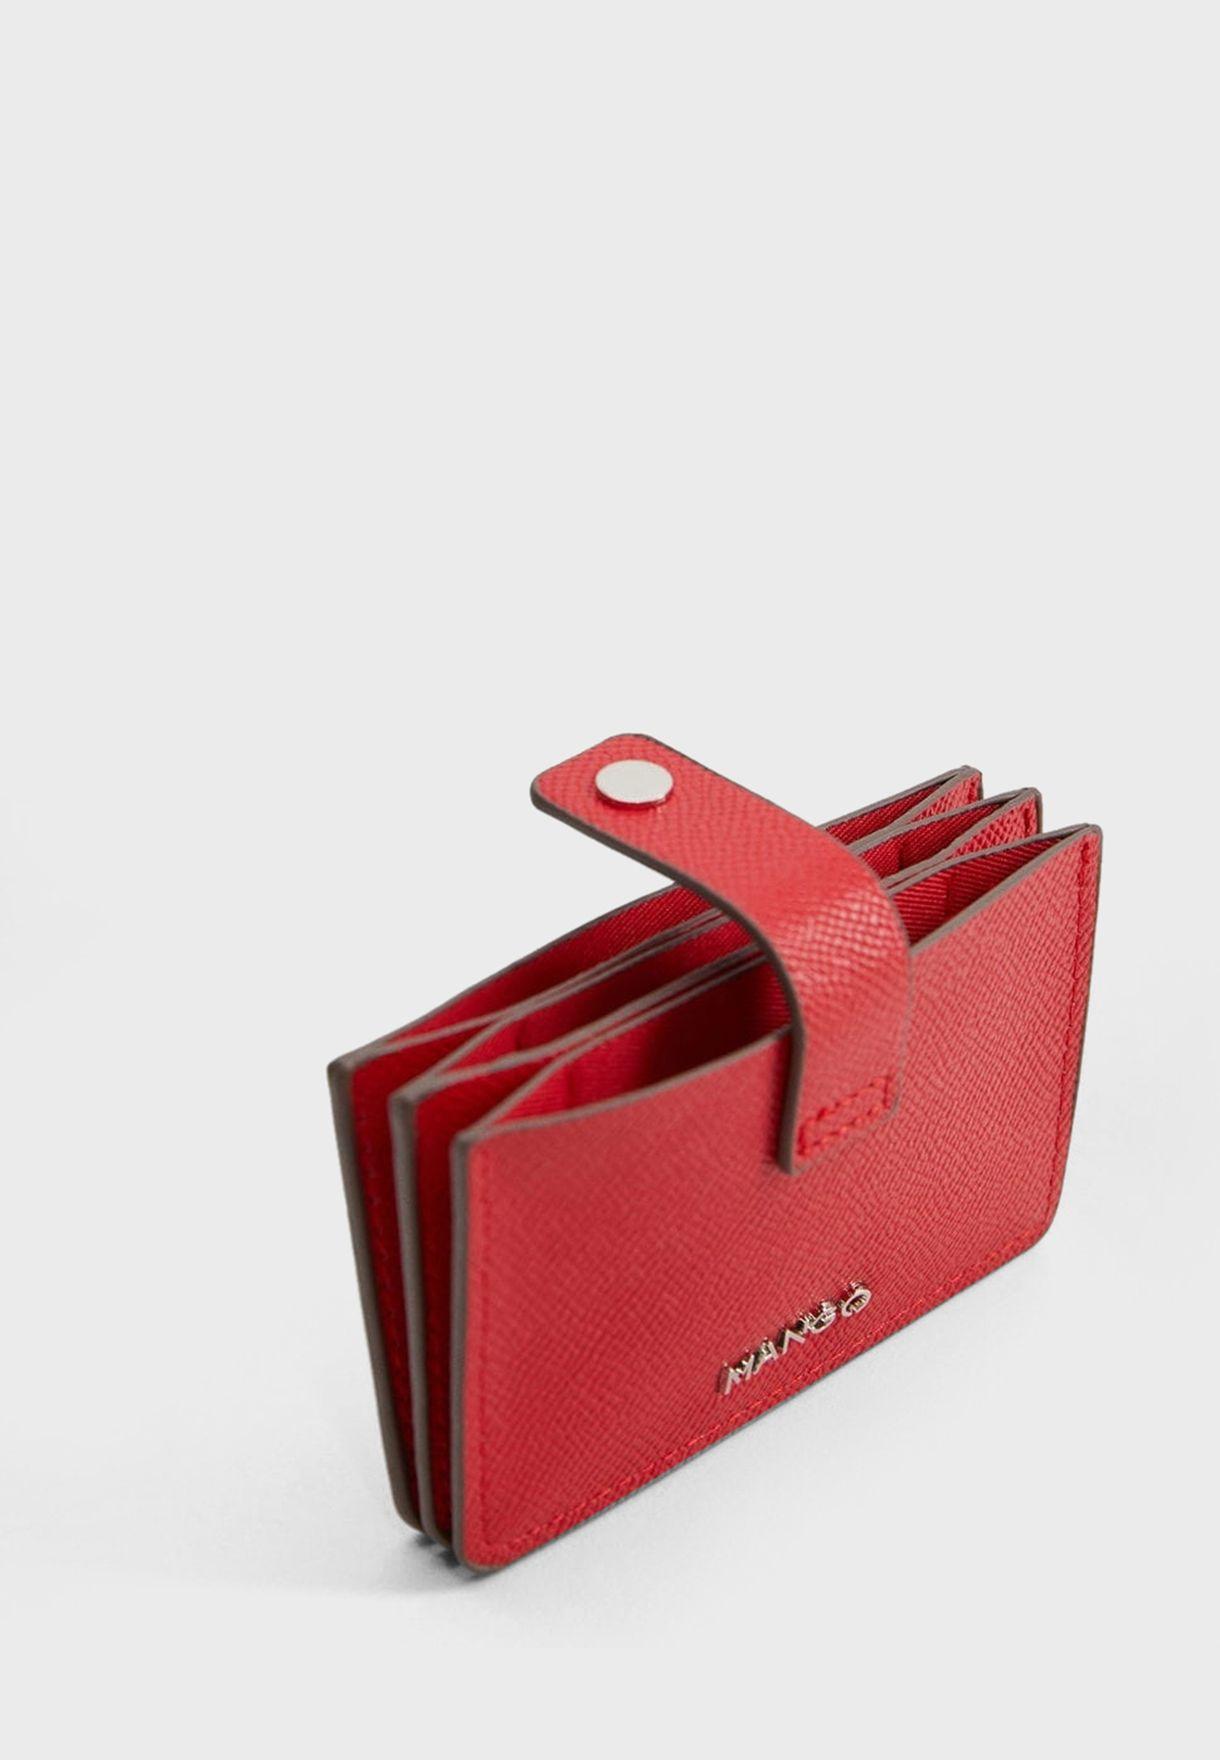 Muxia Multiple Compartment Cardholder